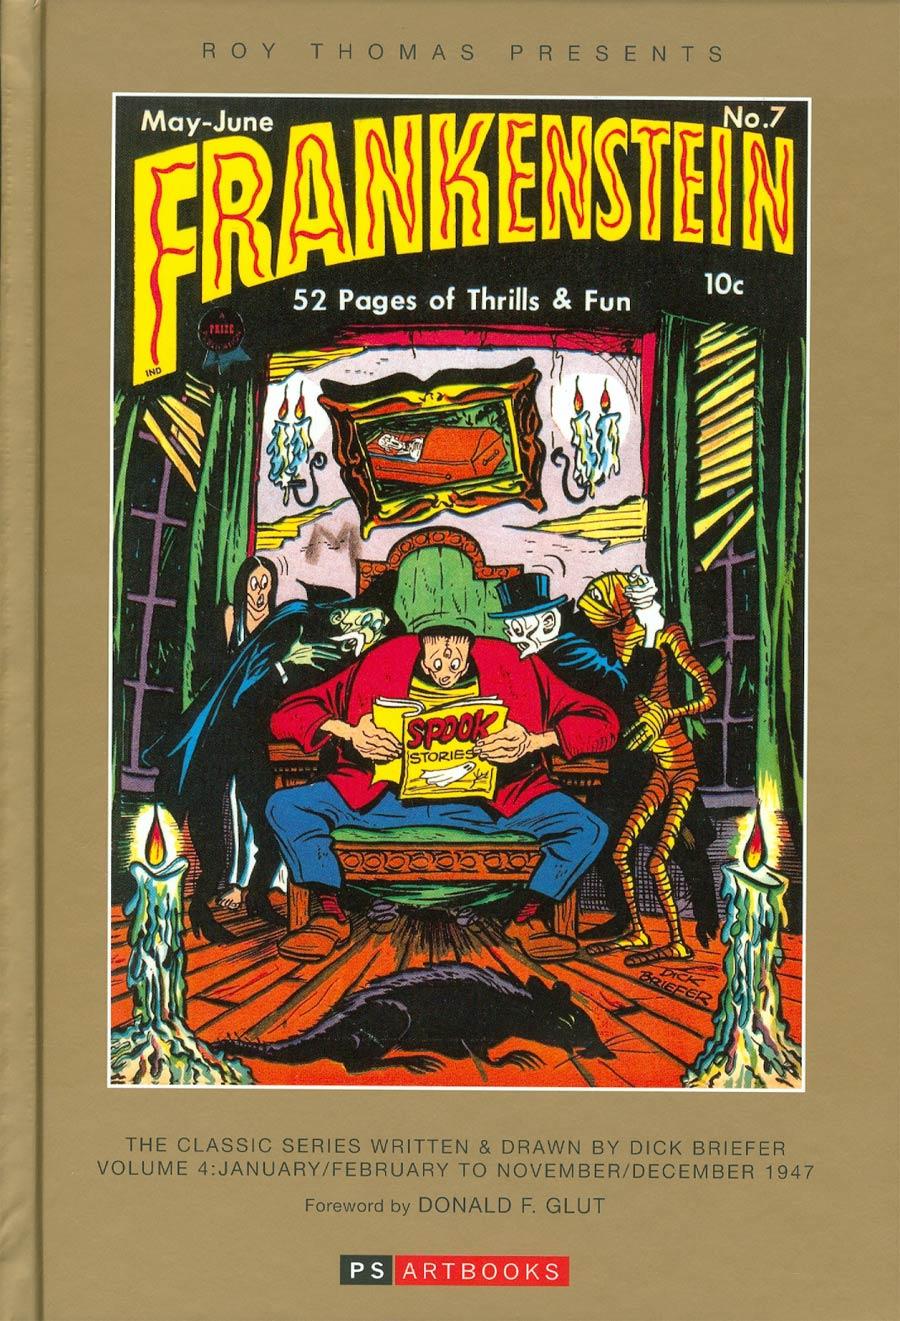 Roy Thomas Presents Dick Briefers Frankenstein Vol 4 1947 HC